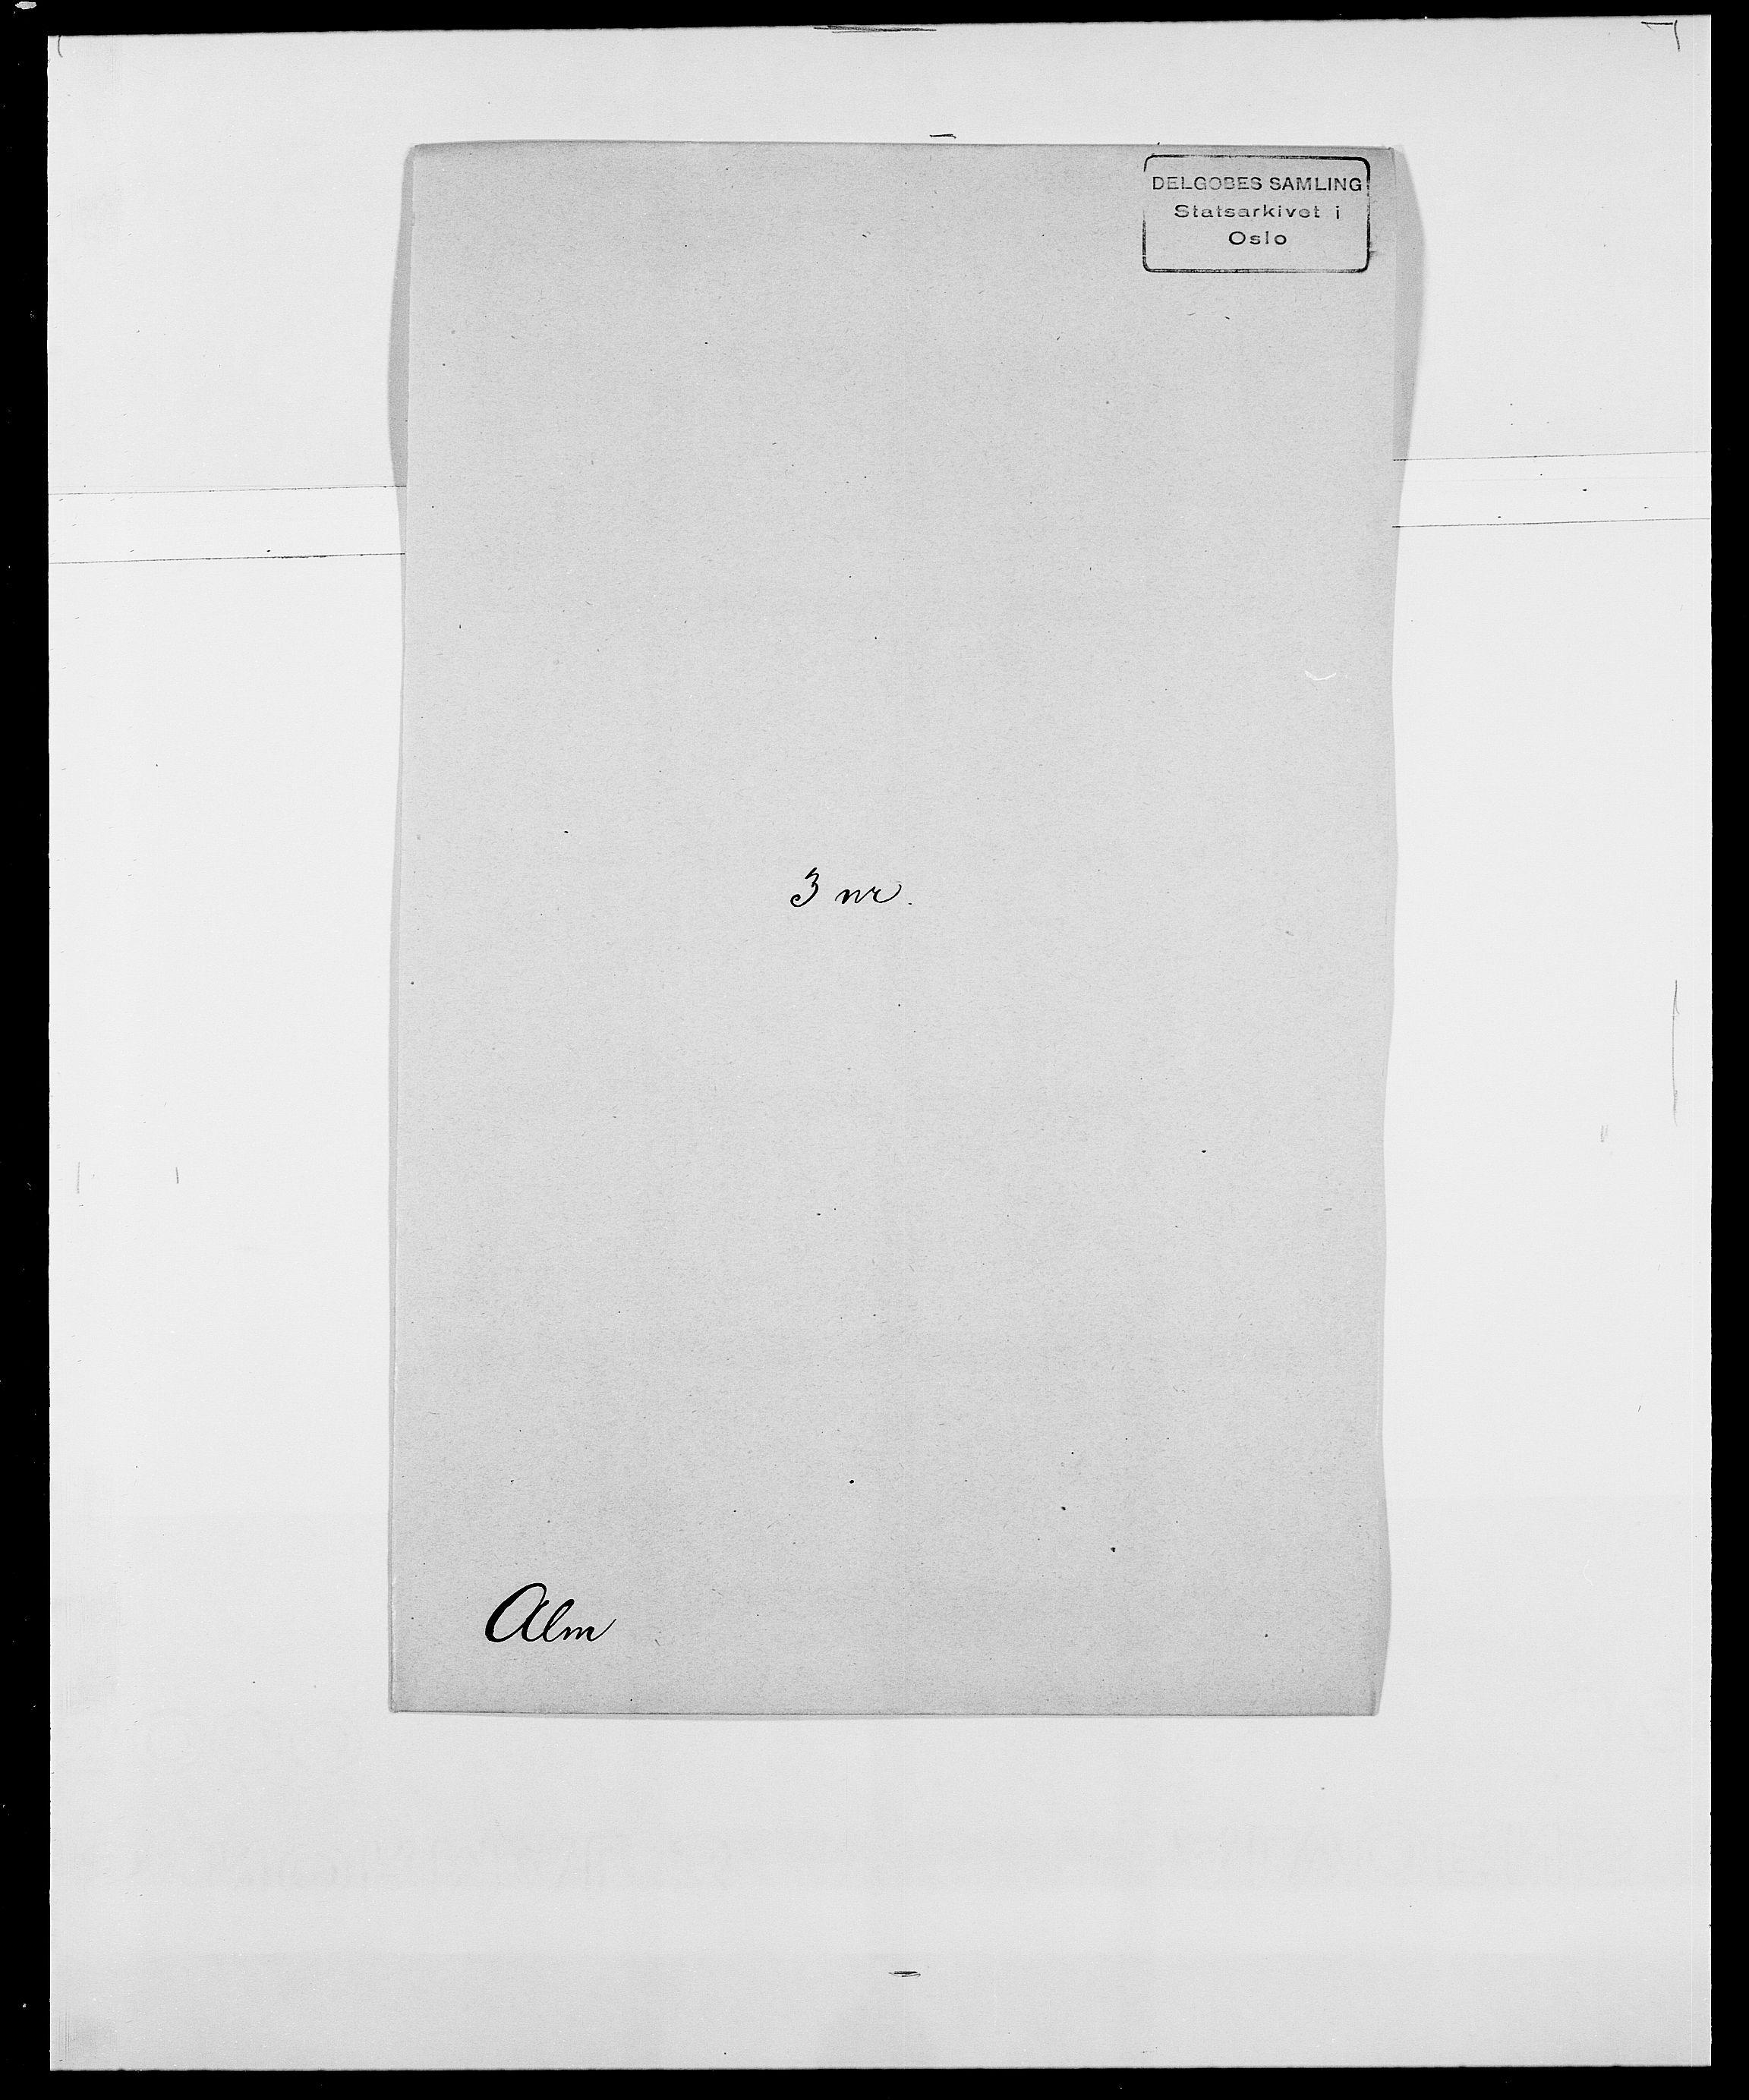 SAO, Delgobe, Charles Antoine - samling, D/Da/L0001: Aabye - Angerman, s. 432